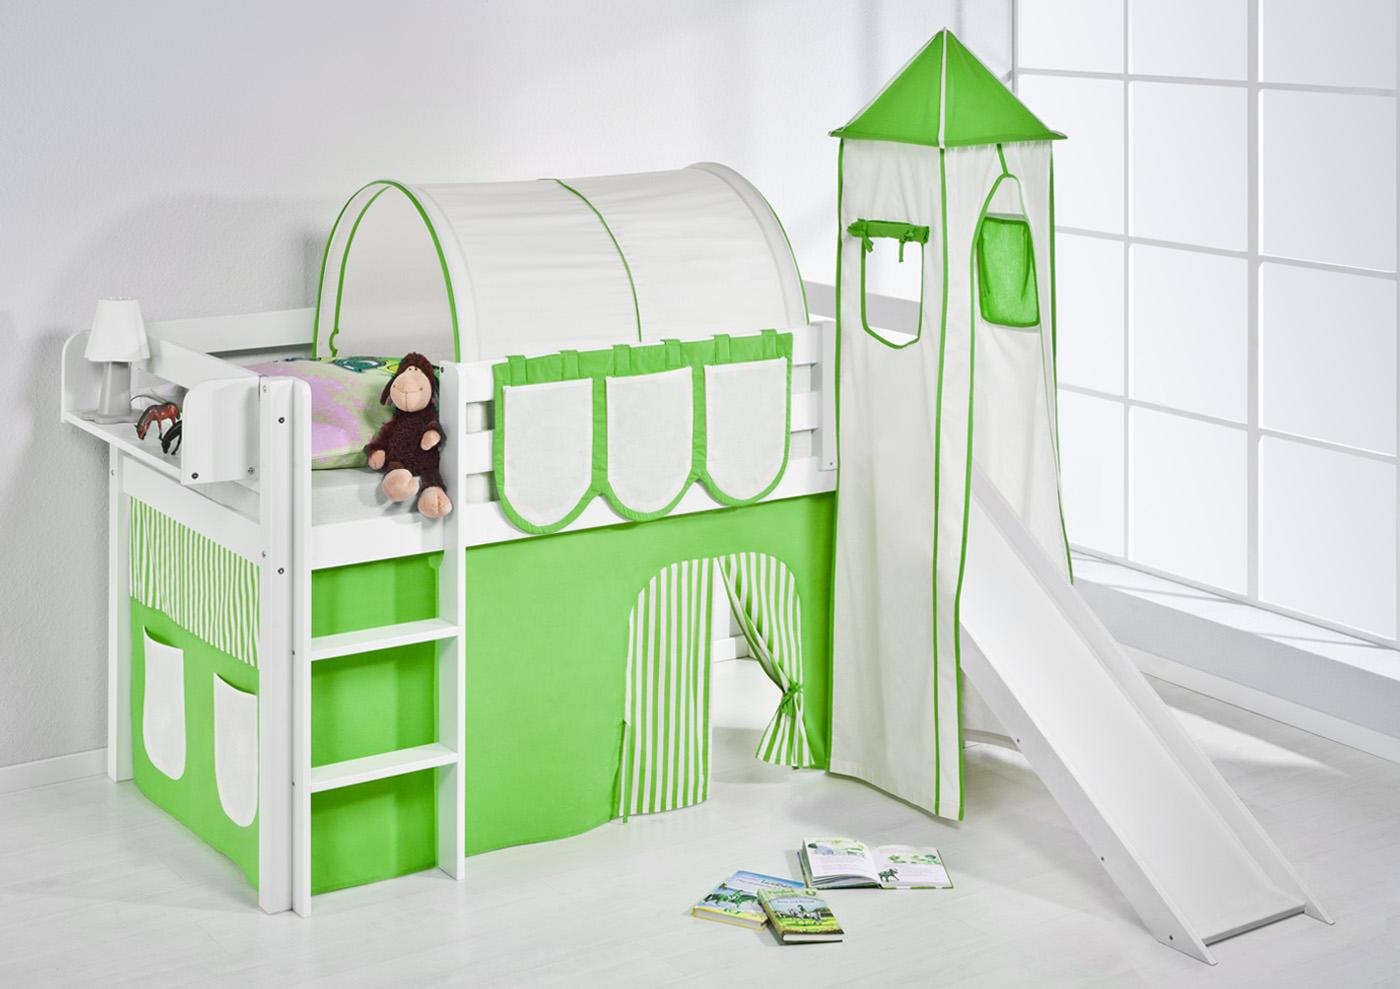 Cool Spielbett Hochbett Kinderbett Kinder Bett JELLE mit Turm und  EH39